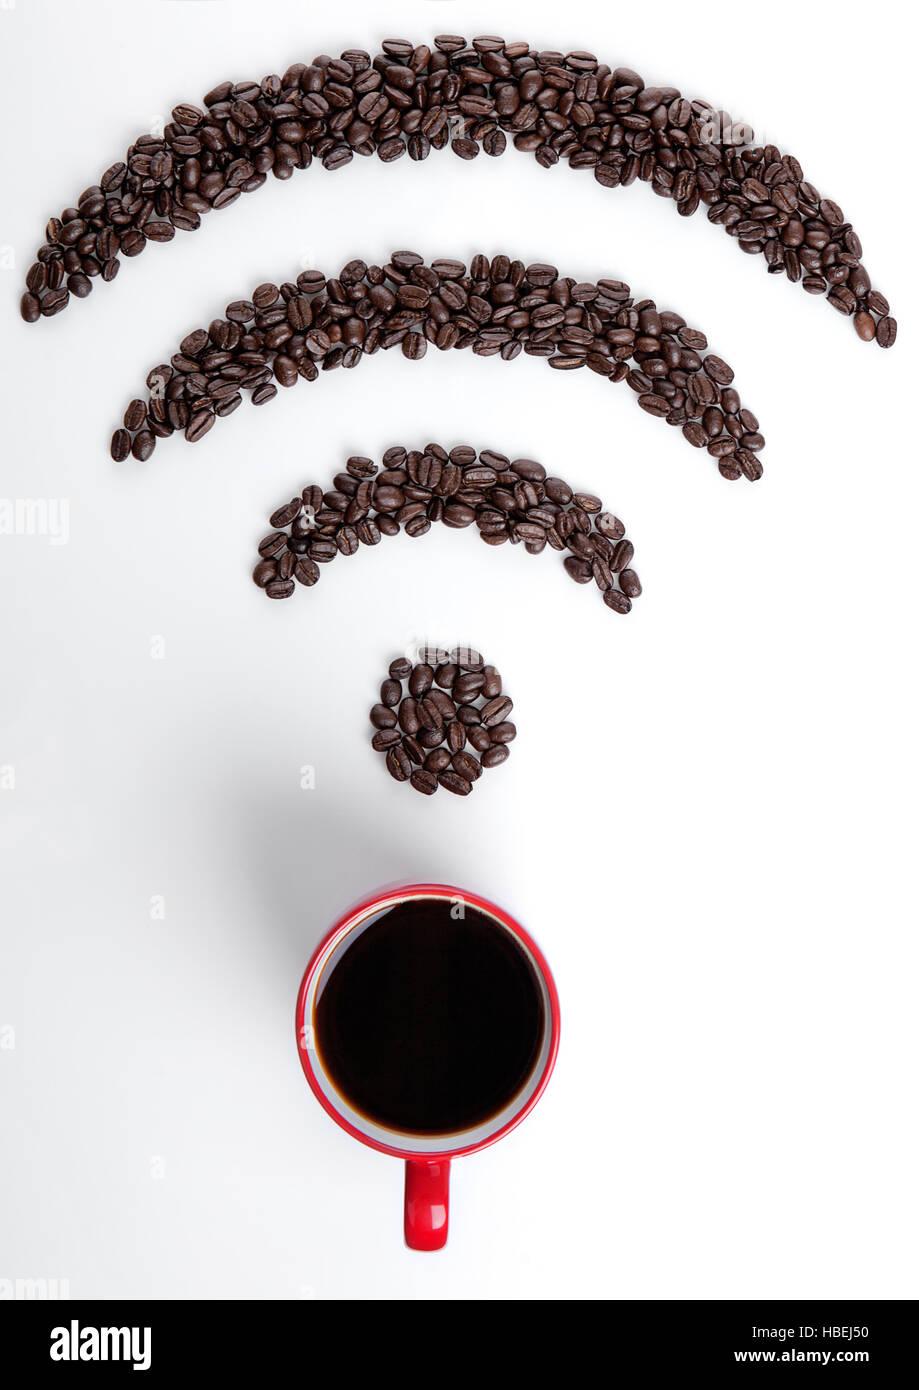 Taza de café de color rojo con wi-fi icon frijoles de café sobre fondo blanco. Imagen De Stock